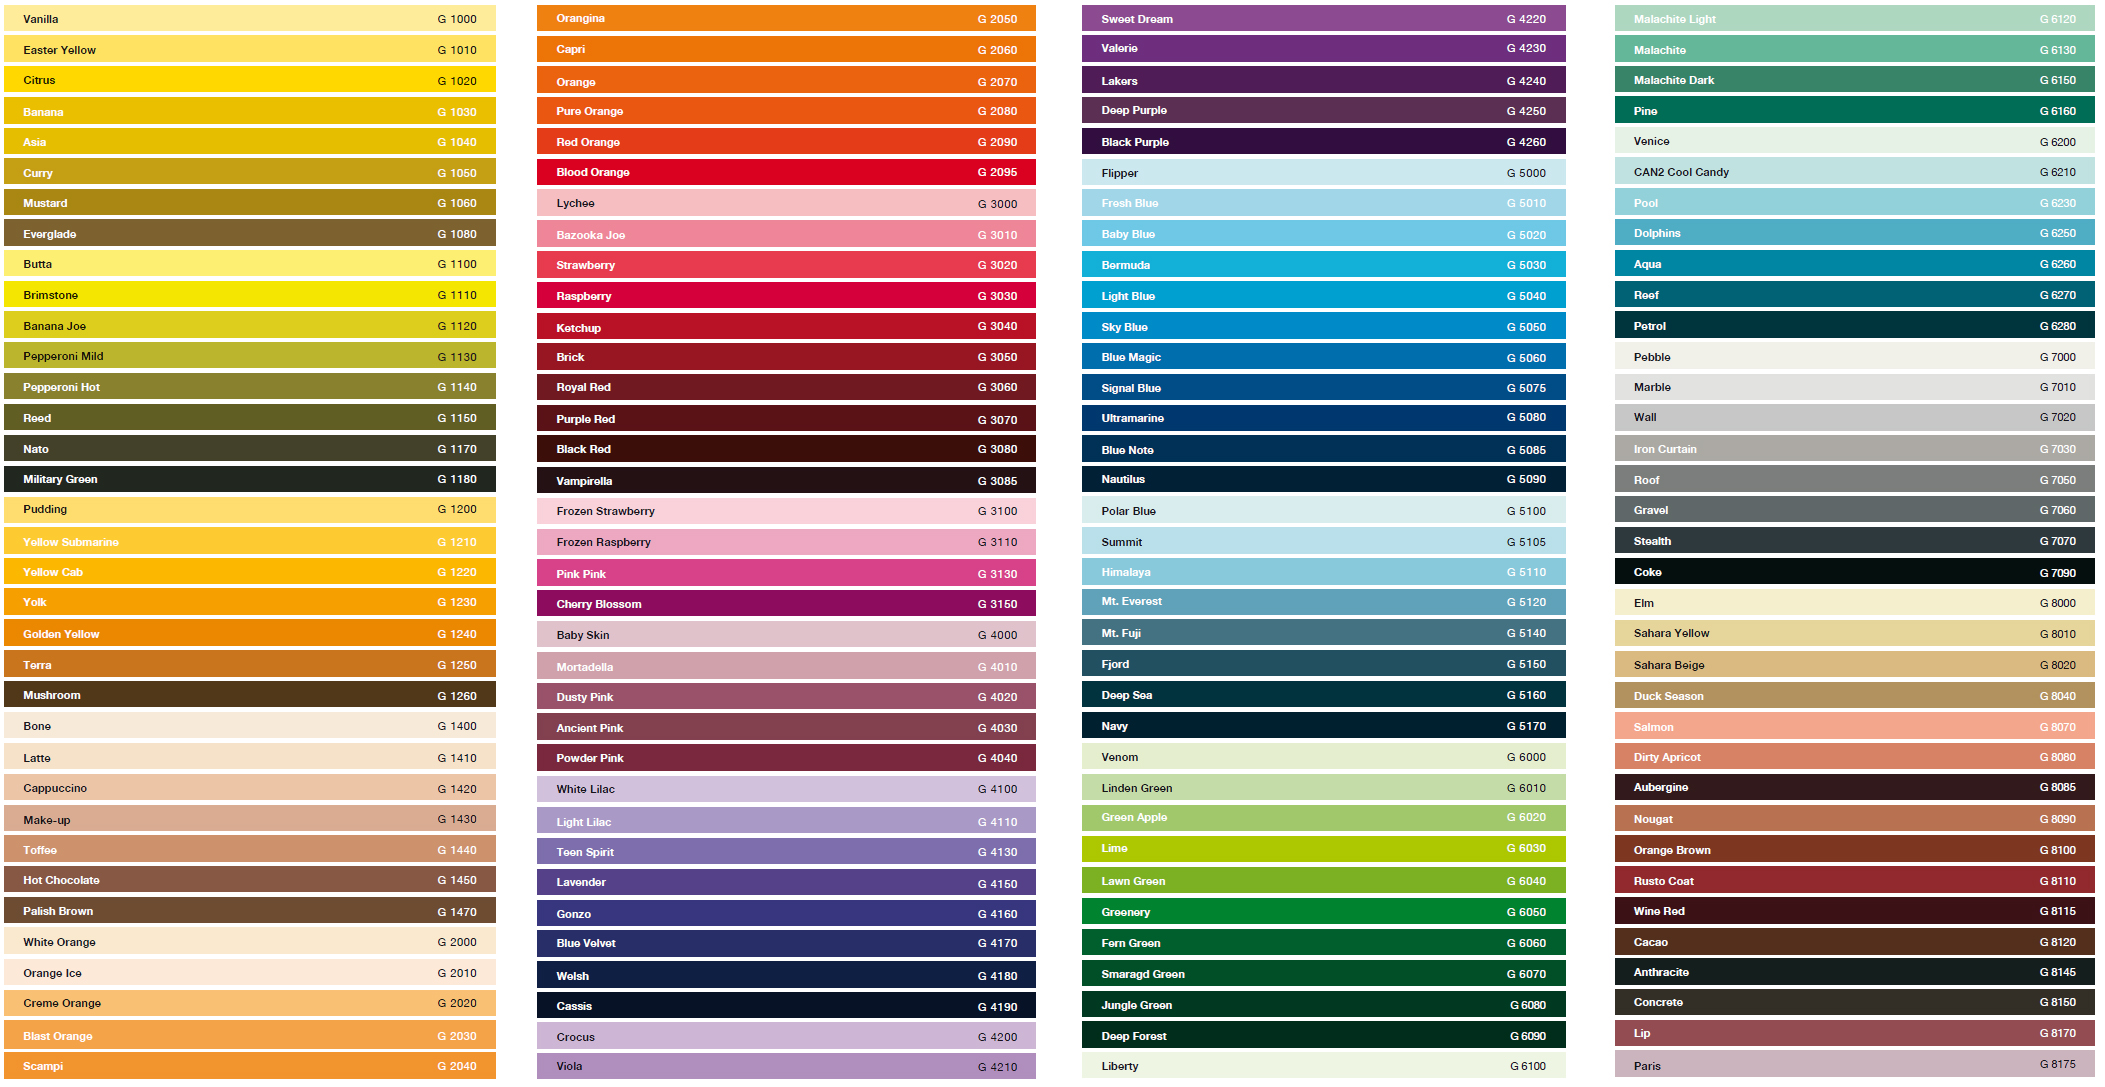 Montana Colour Chart.jpg